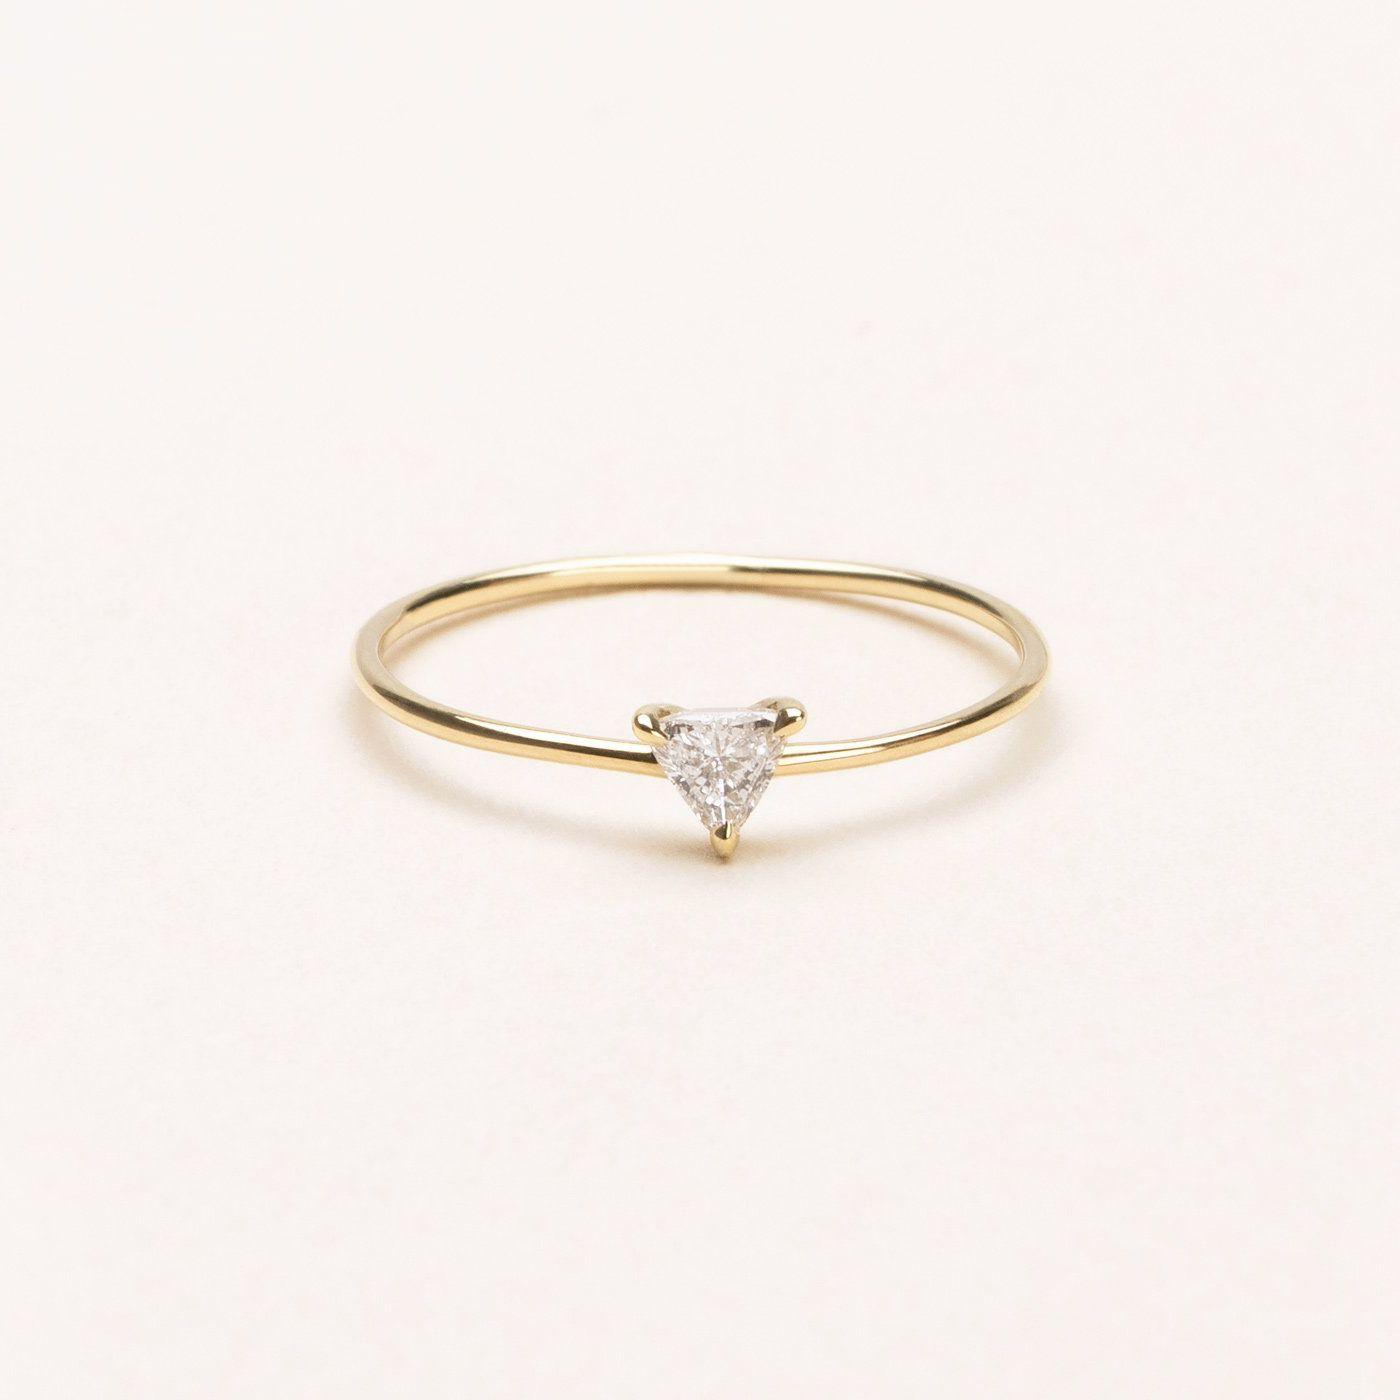 VRAI Trillion Diamond Ring